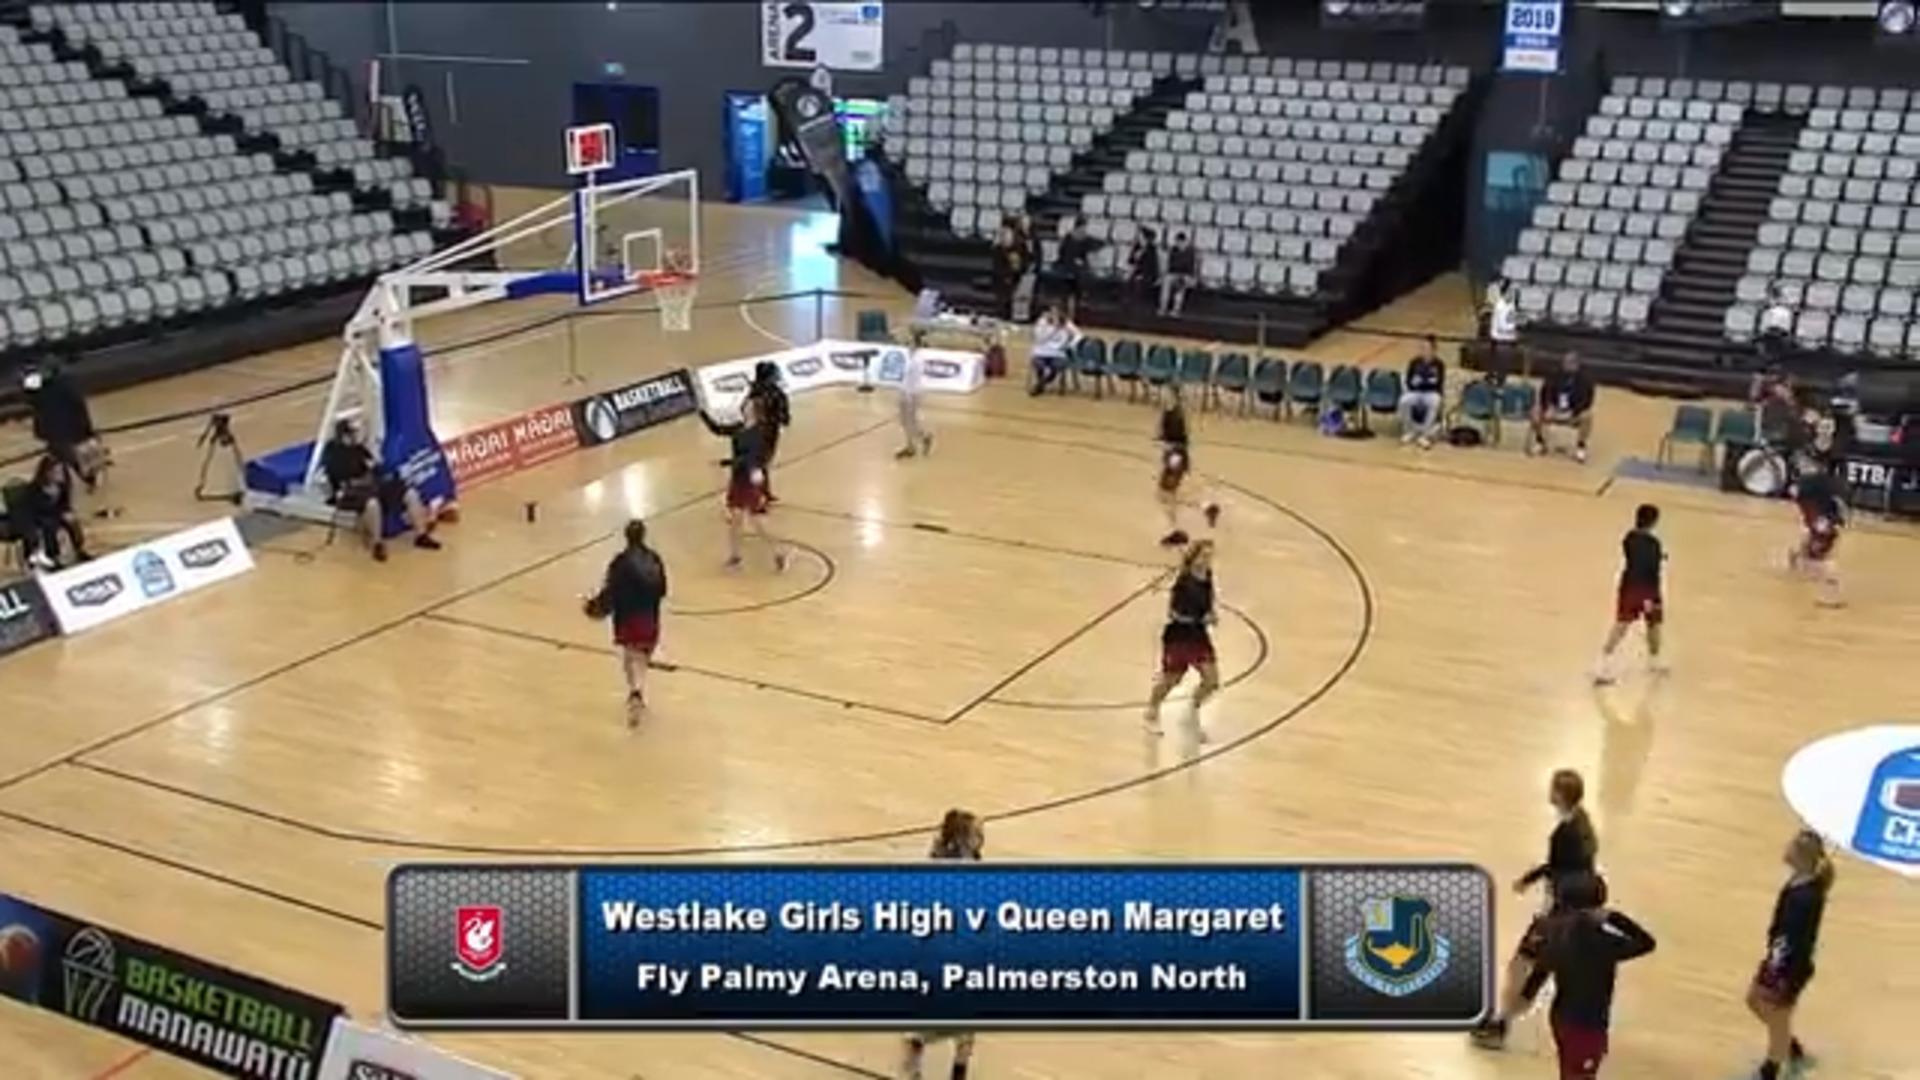 Video for Schick Basketball Champs 2018, Westlake Girls ki Queen Margaret  (AA Girls 3/4 Playoff)